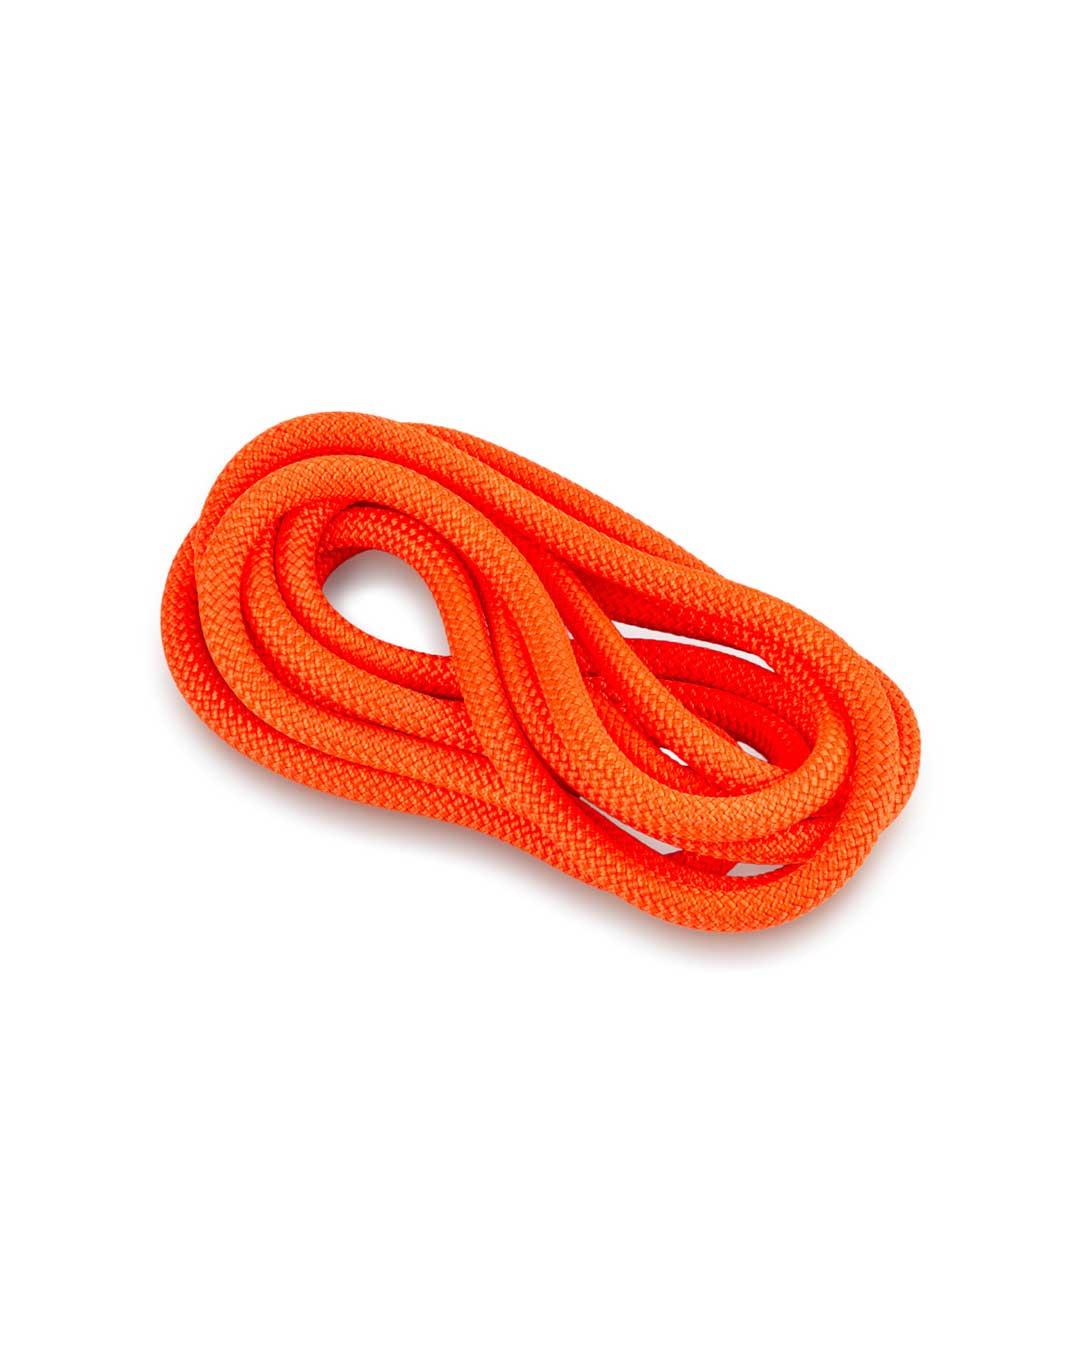 Cuerda de gimnasia rítmica Venturelli (Certificada FIG) naranja - 3 m